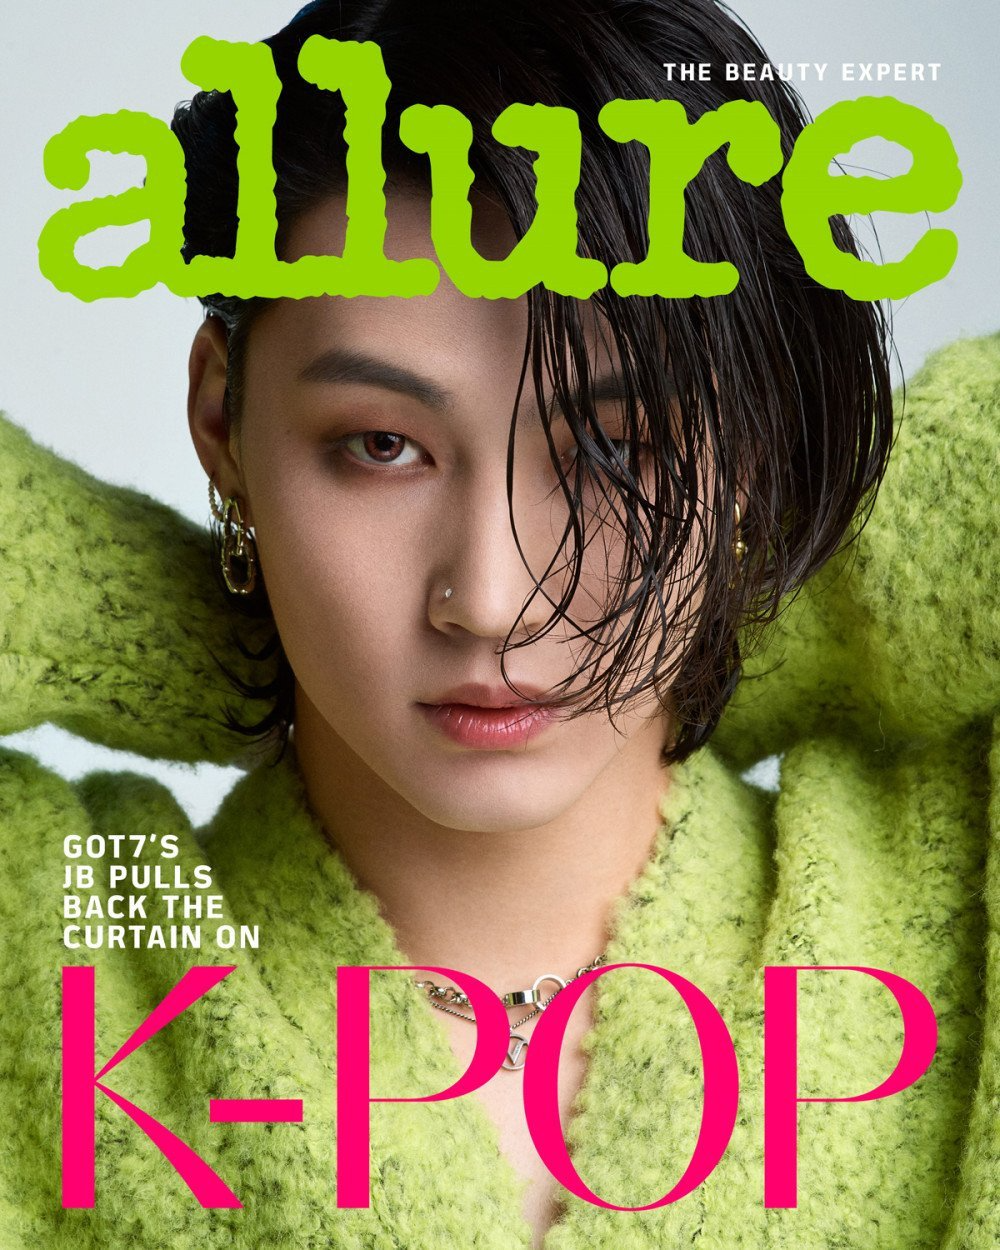 Top 12 Best Magazine Covers Featuring K Pop Idols Got7 Global Beauty Beauty Expert